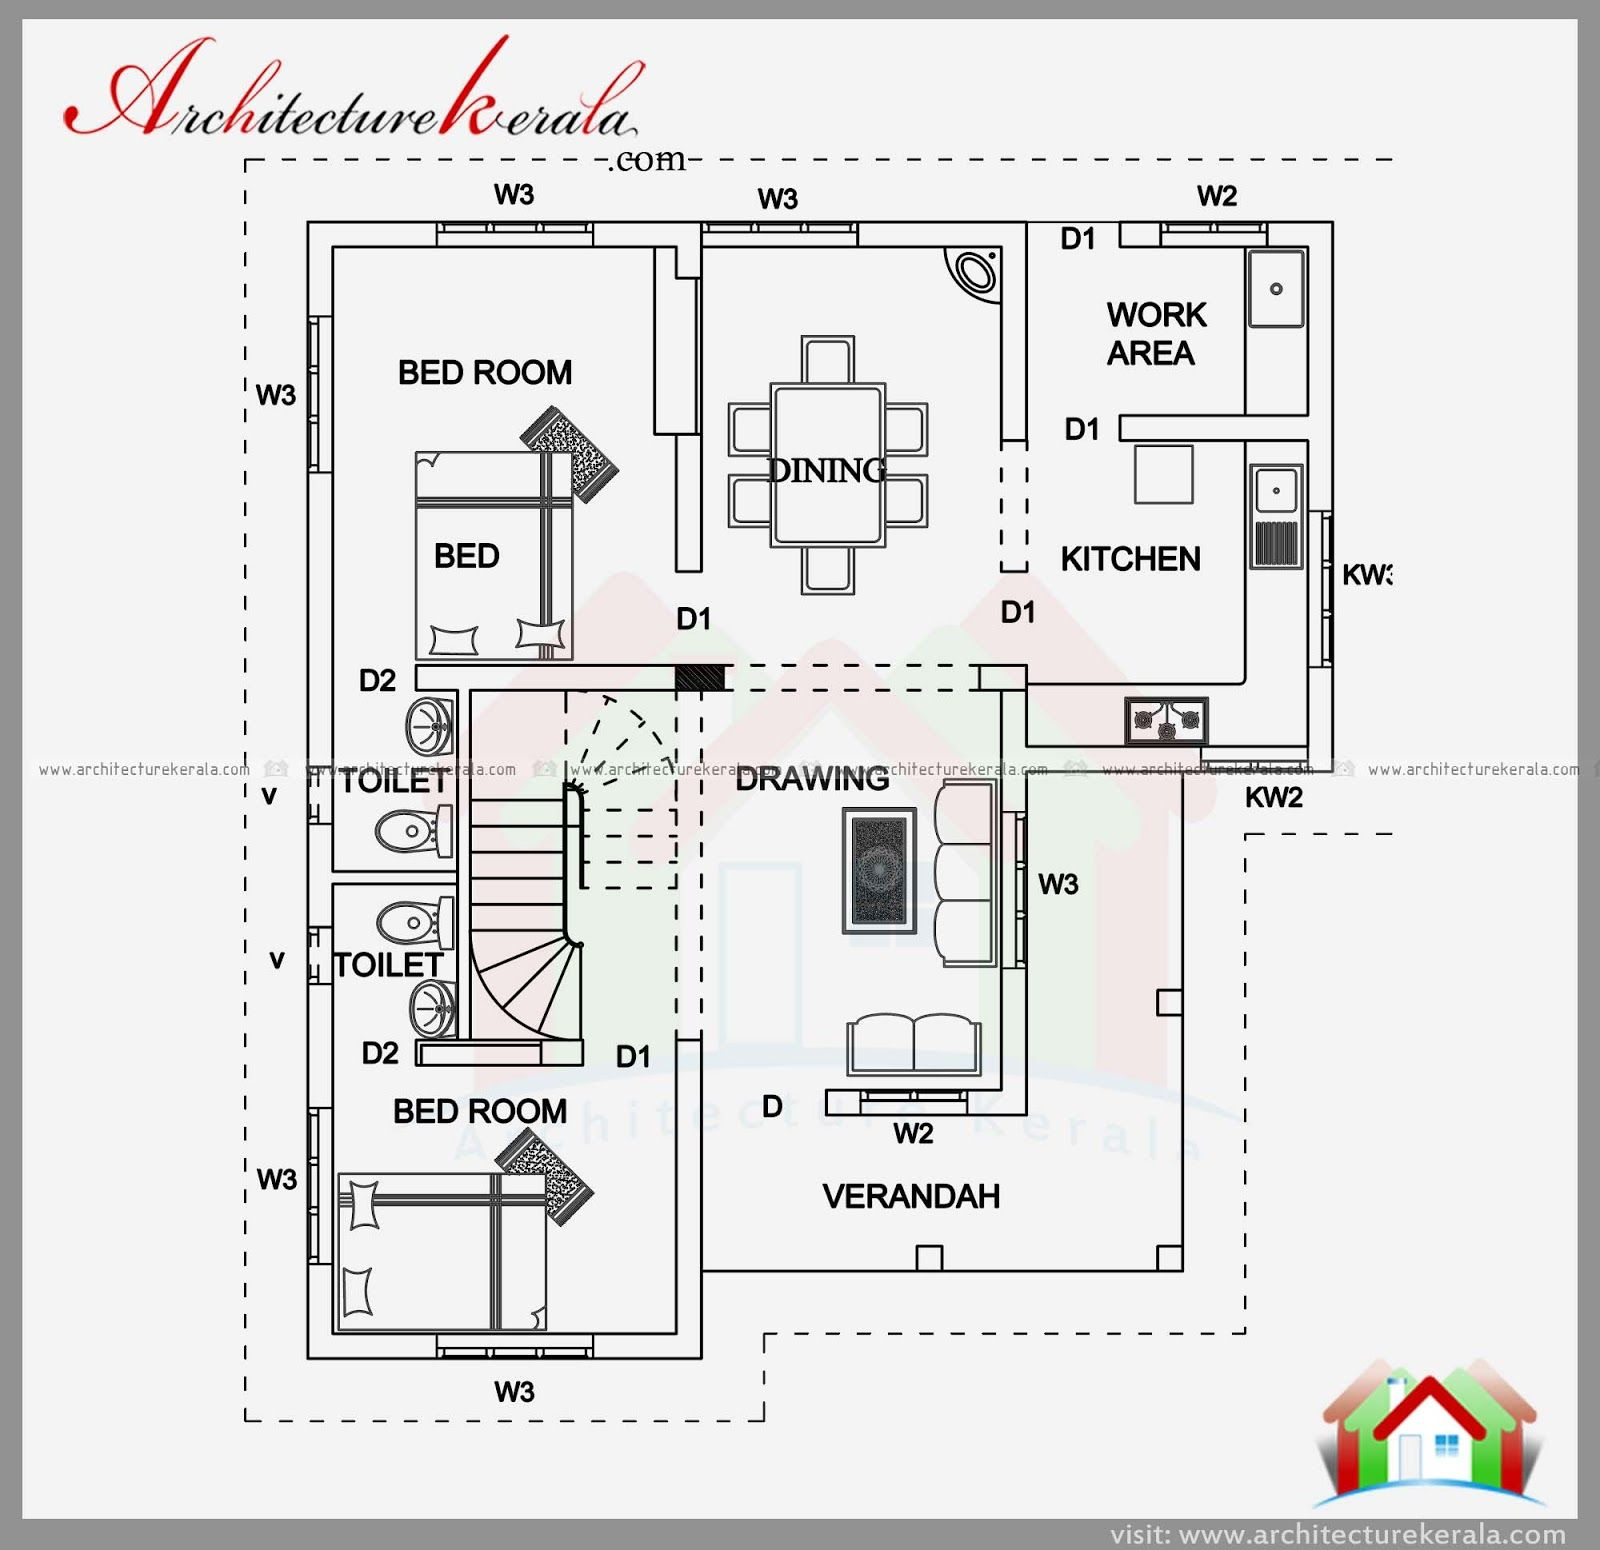 Sqft House Plan And Elevation Kerala I Sq Ft Room Per Acre House Plans Beautiful House Plans Bedroom Floor Plans